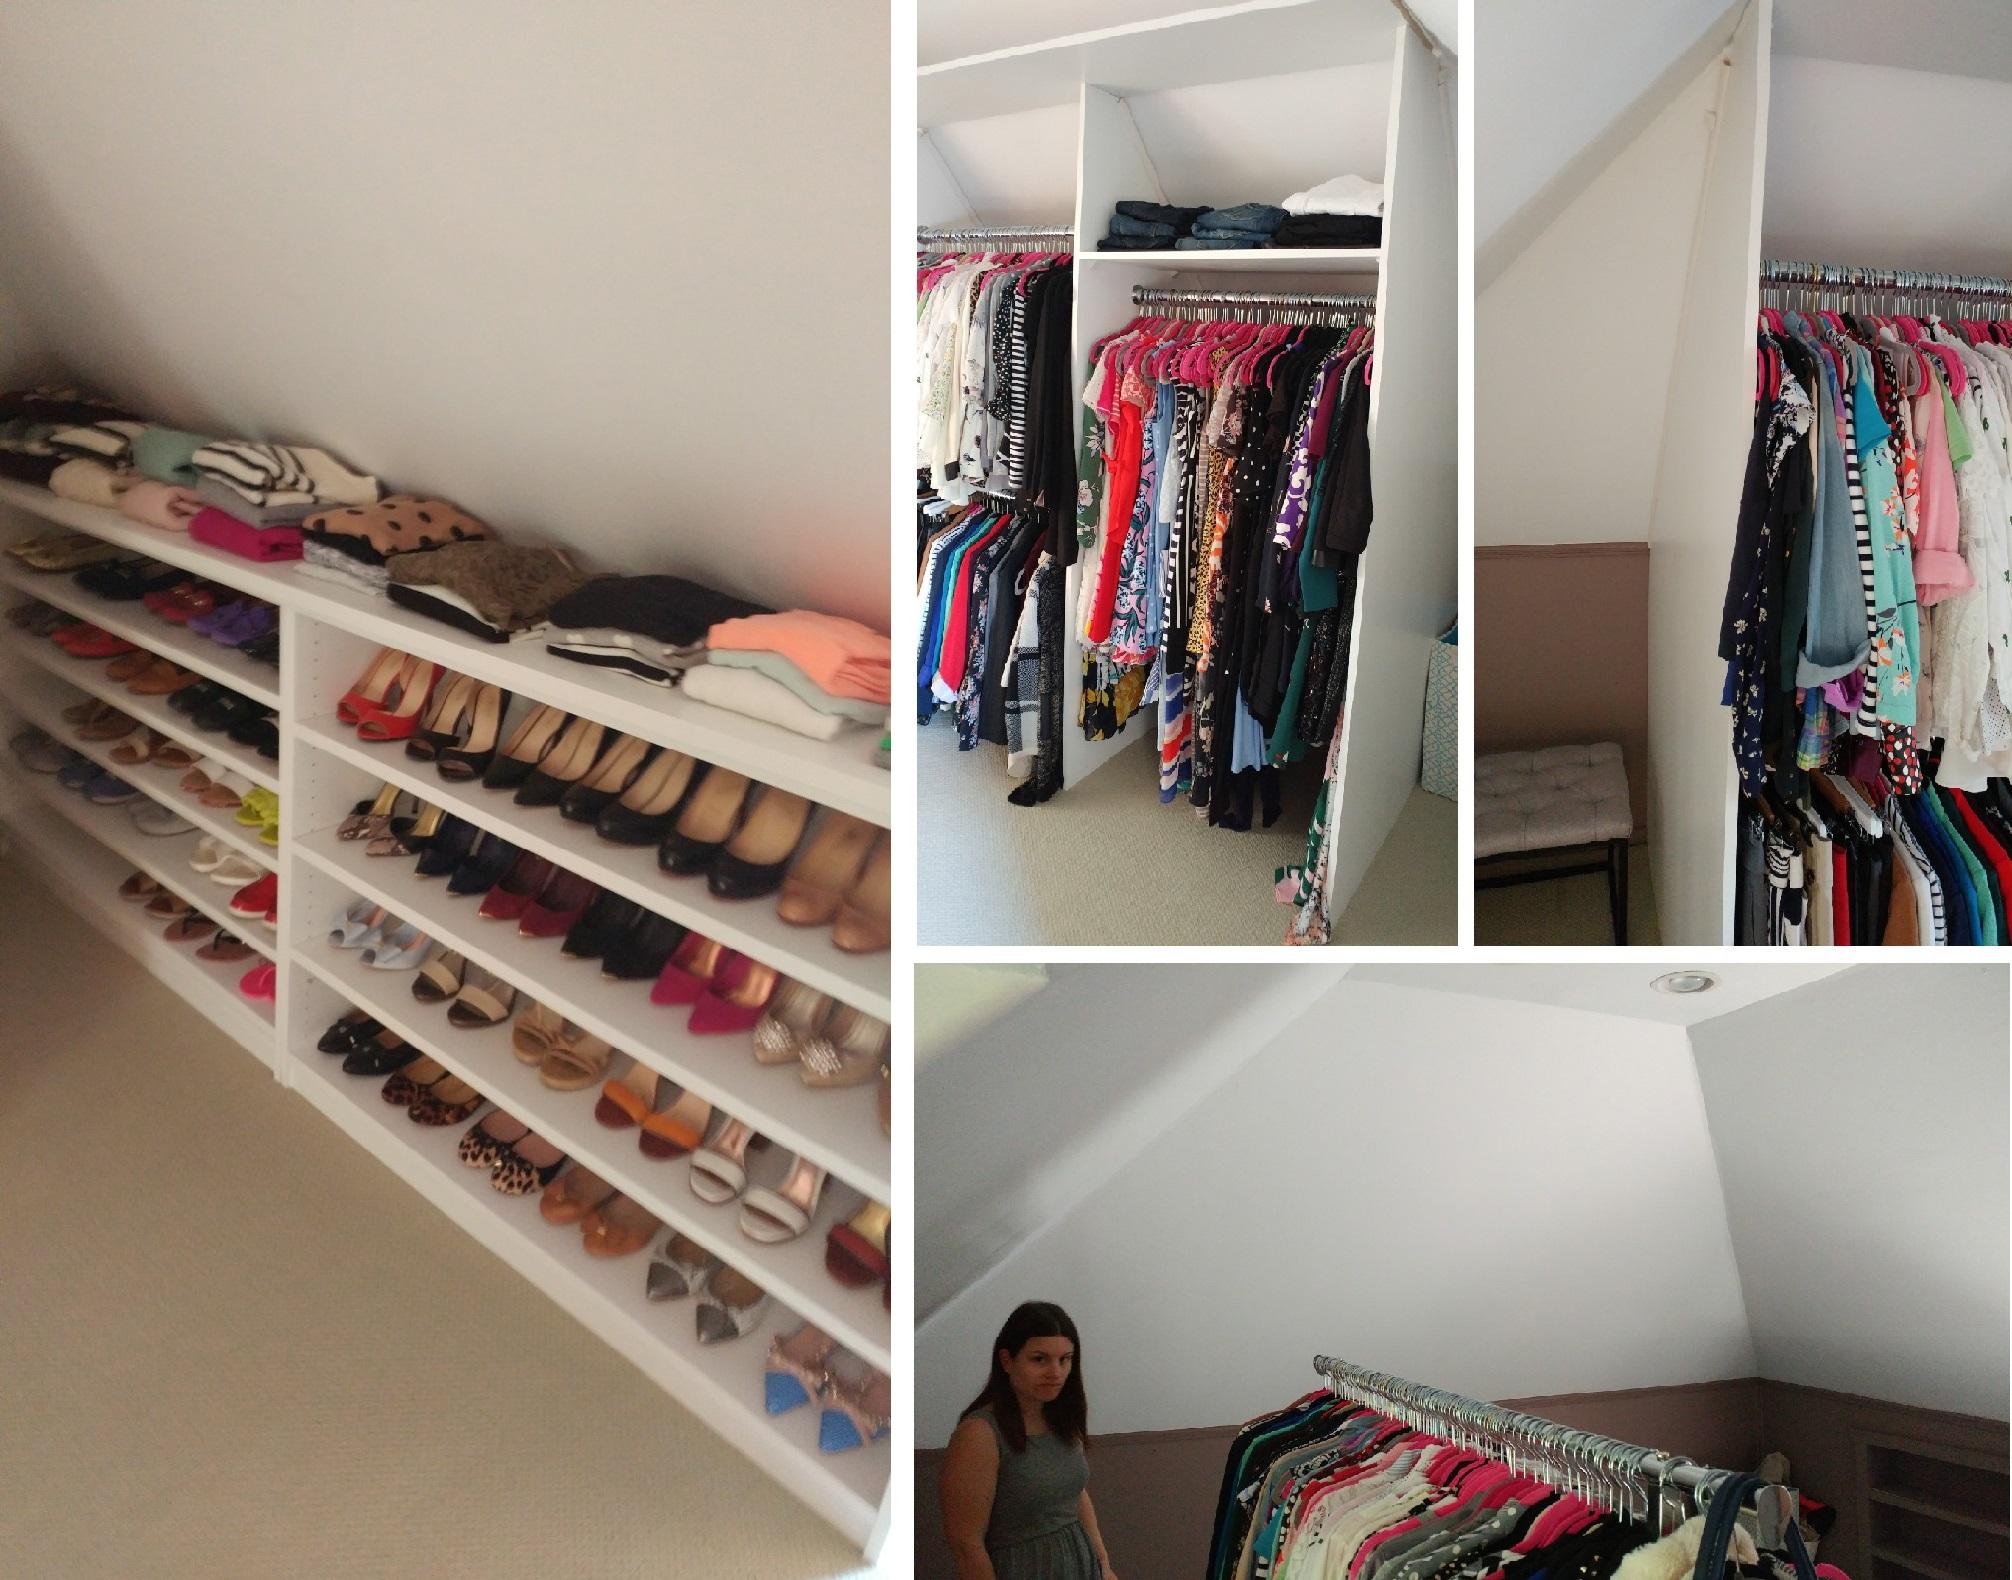 customized walk-in closet in the attic